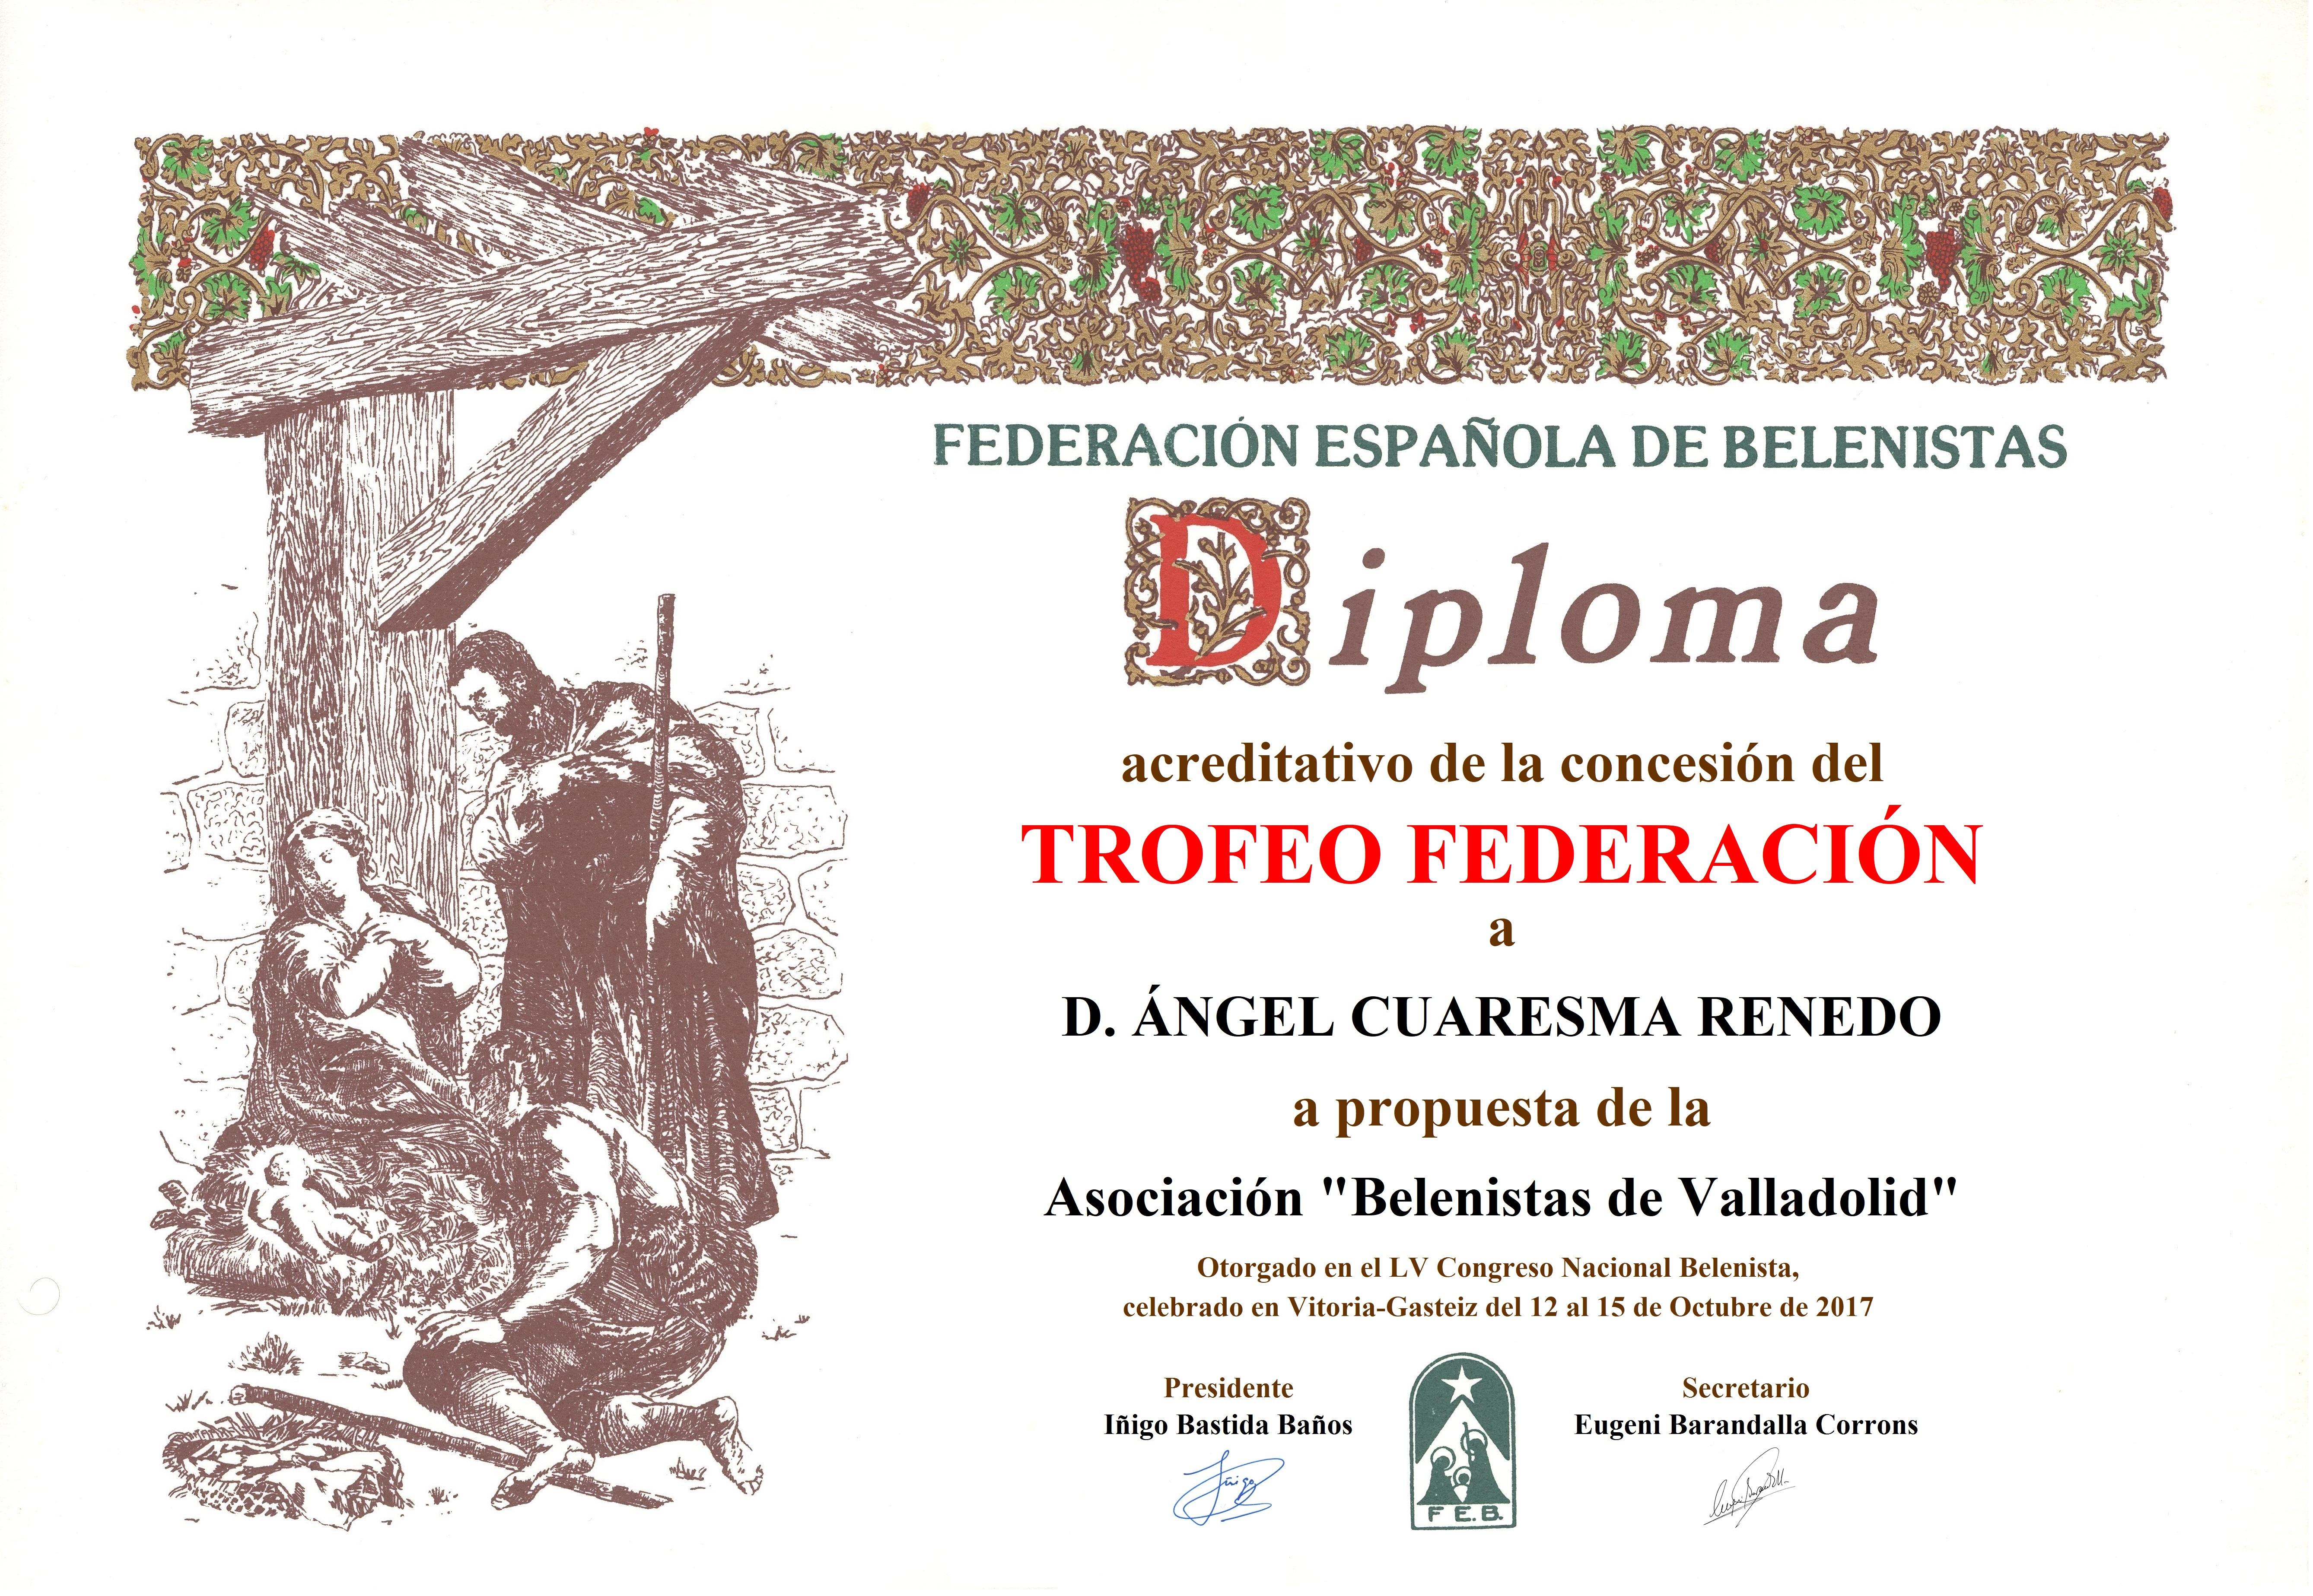 Ángel Cuaresma Renedo – Diploma Trofeo FEB 2017